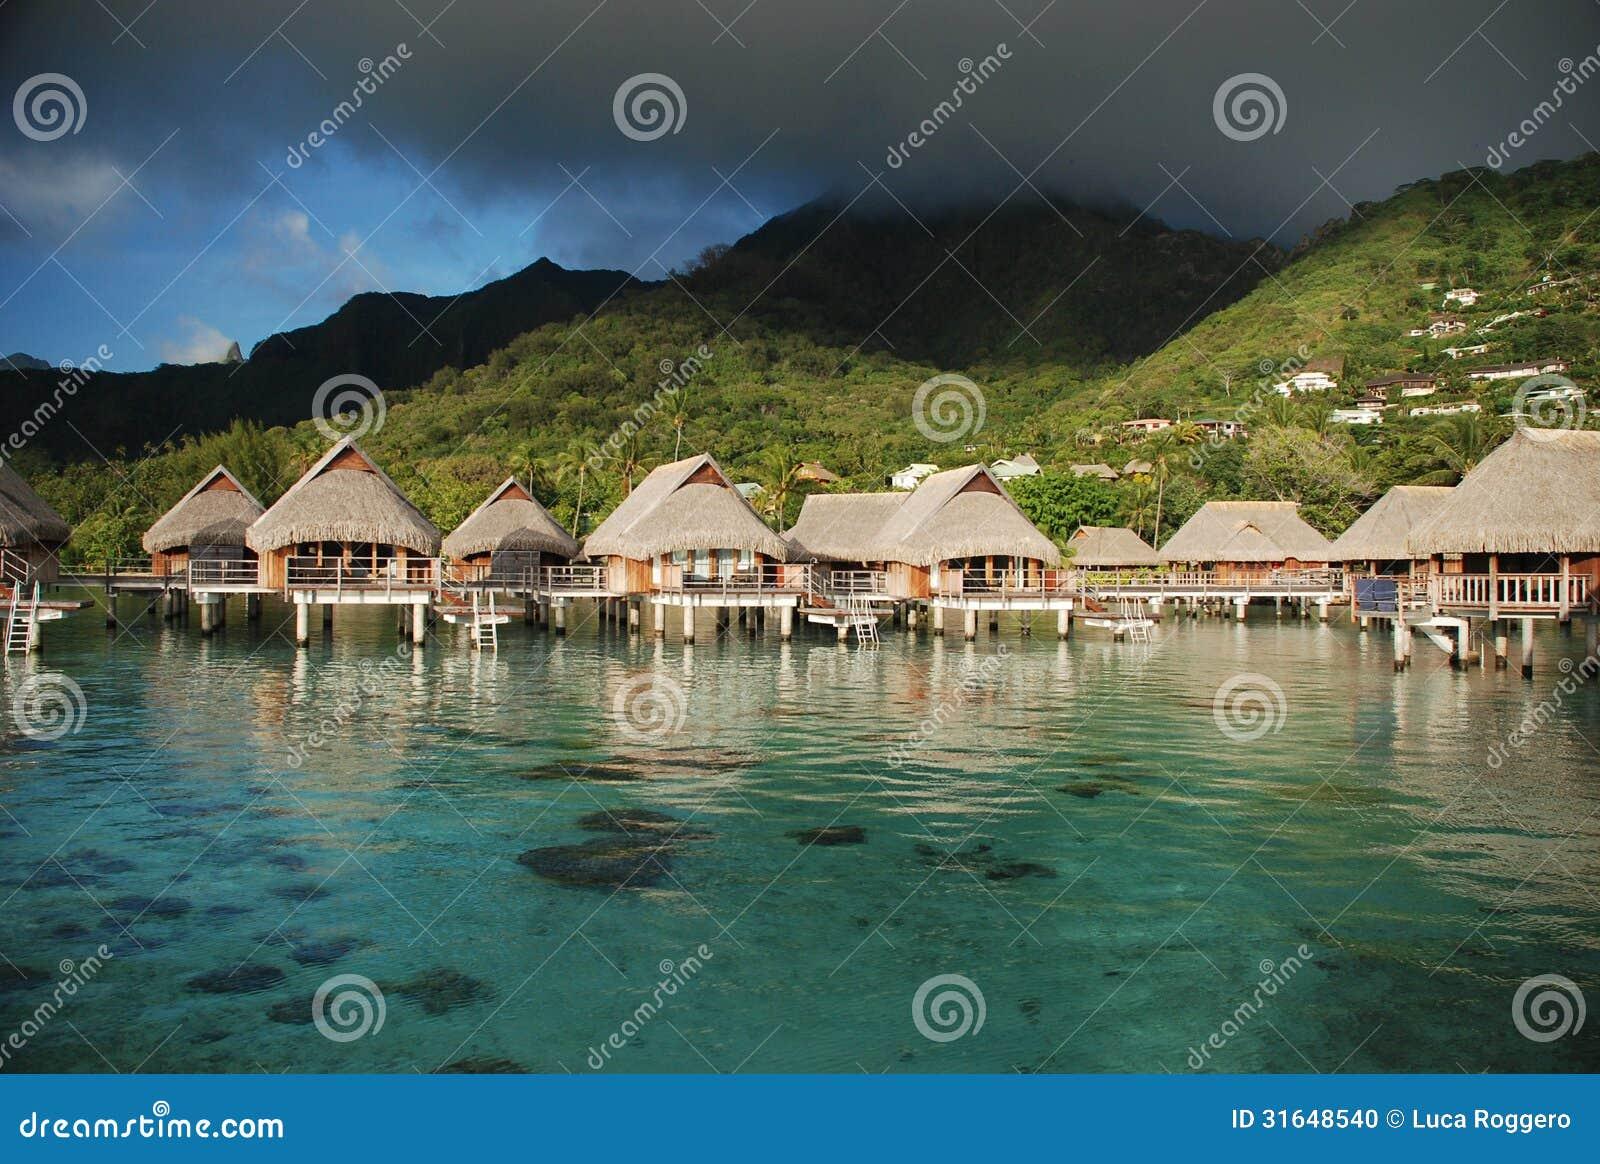 Overwater bungalows. Moorea, French Polynesia